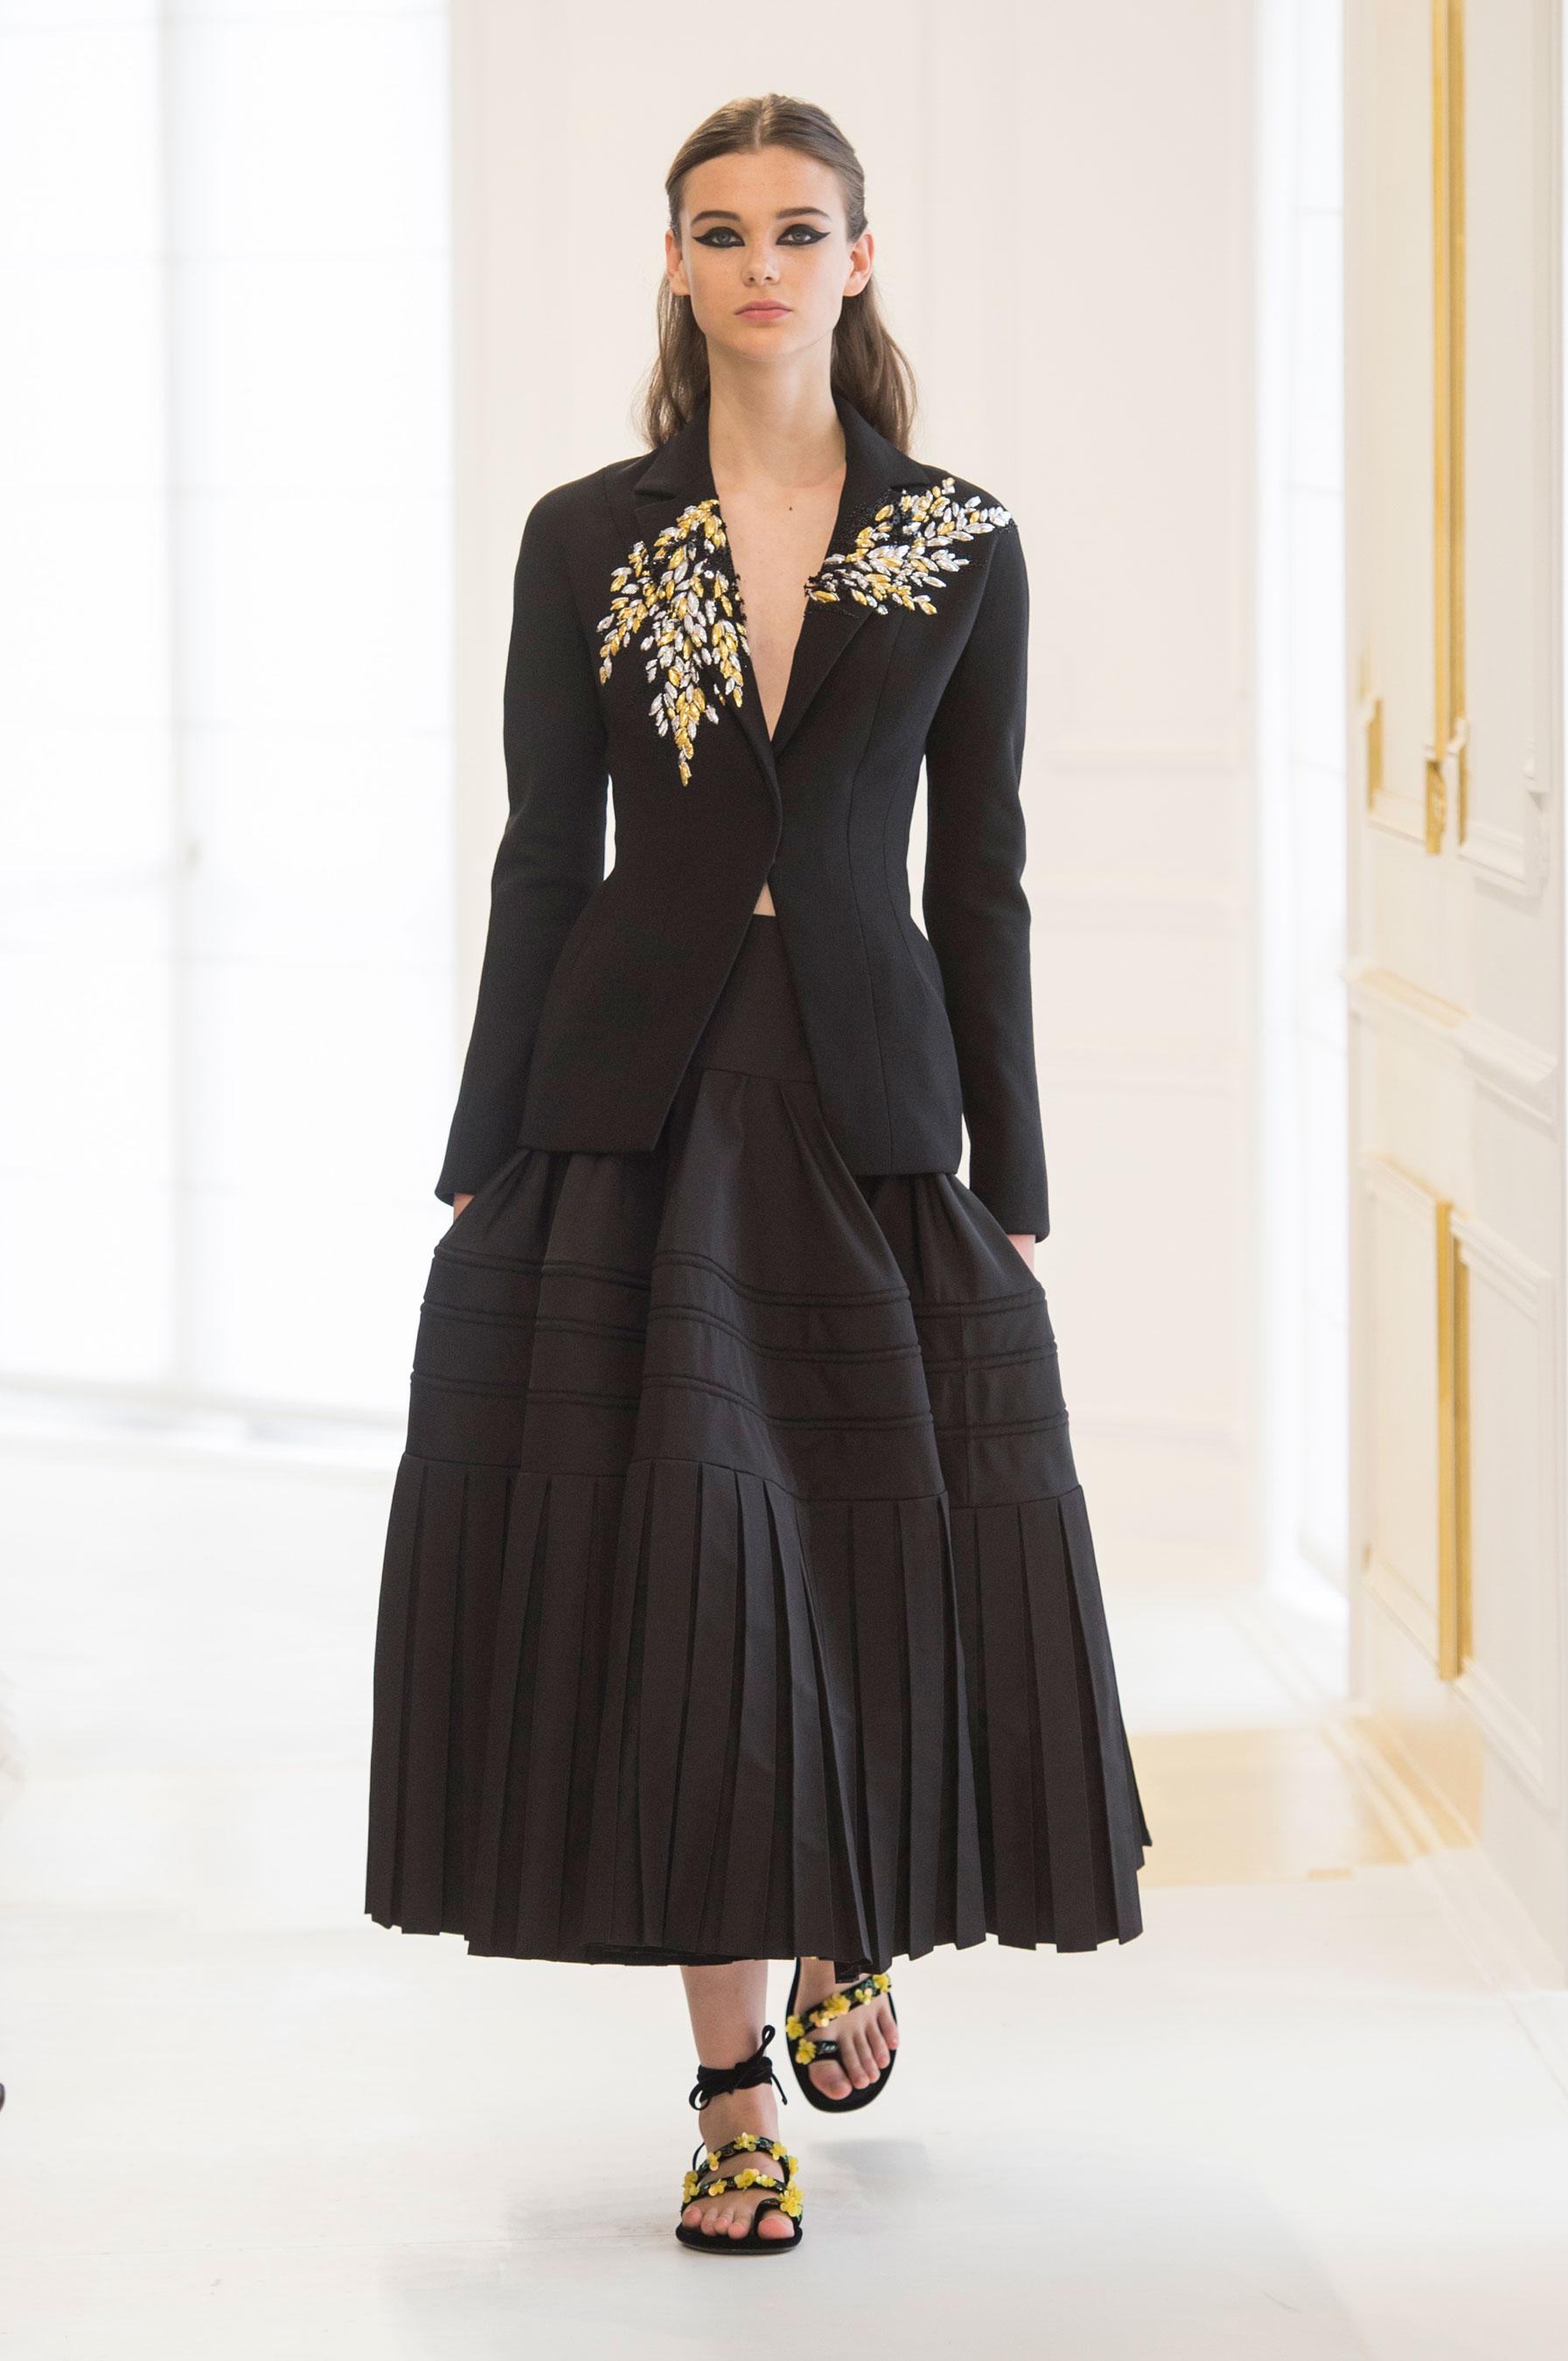 D 233 Fil 233 Christian Dior Haute Couture Automne Hiver 2016